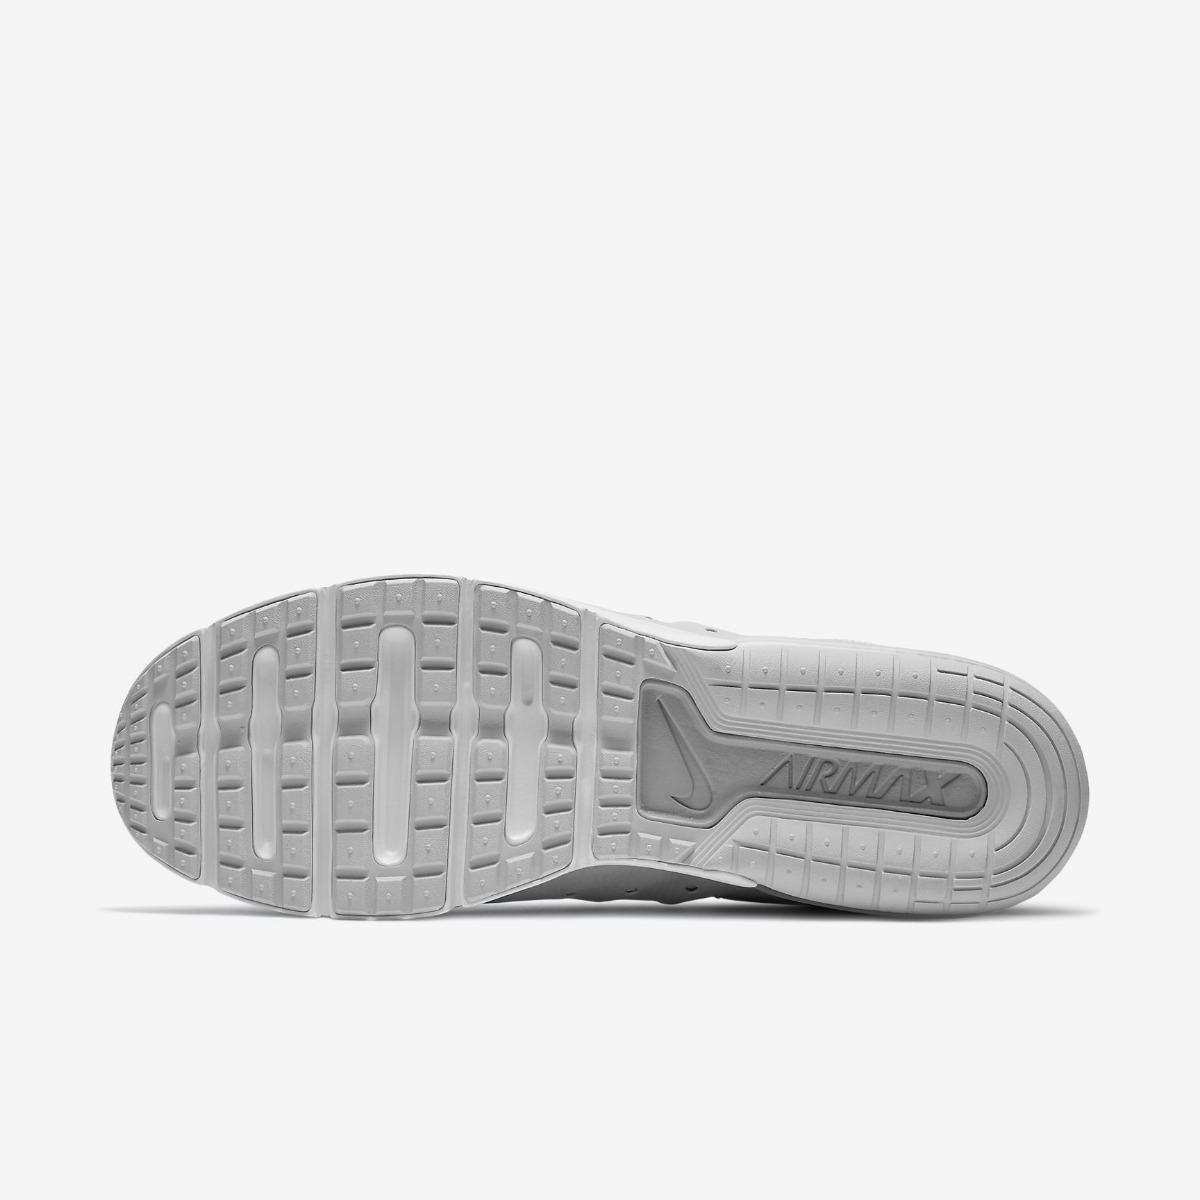 Zapatos Tenis Nike Air Max Sequent 3 Hombre 100% Original